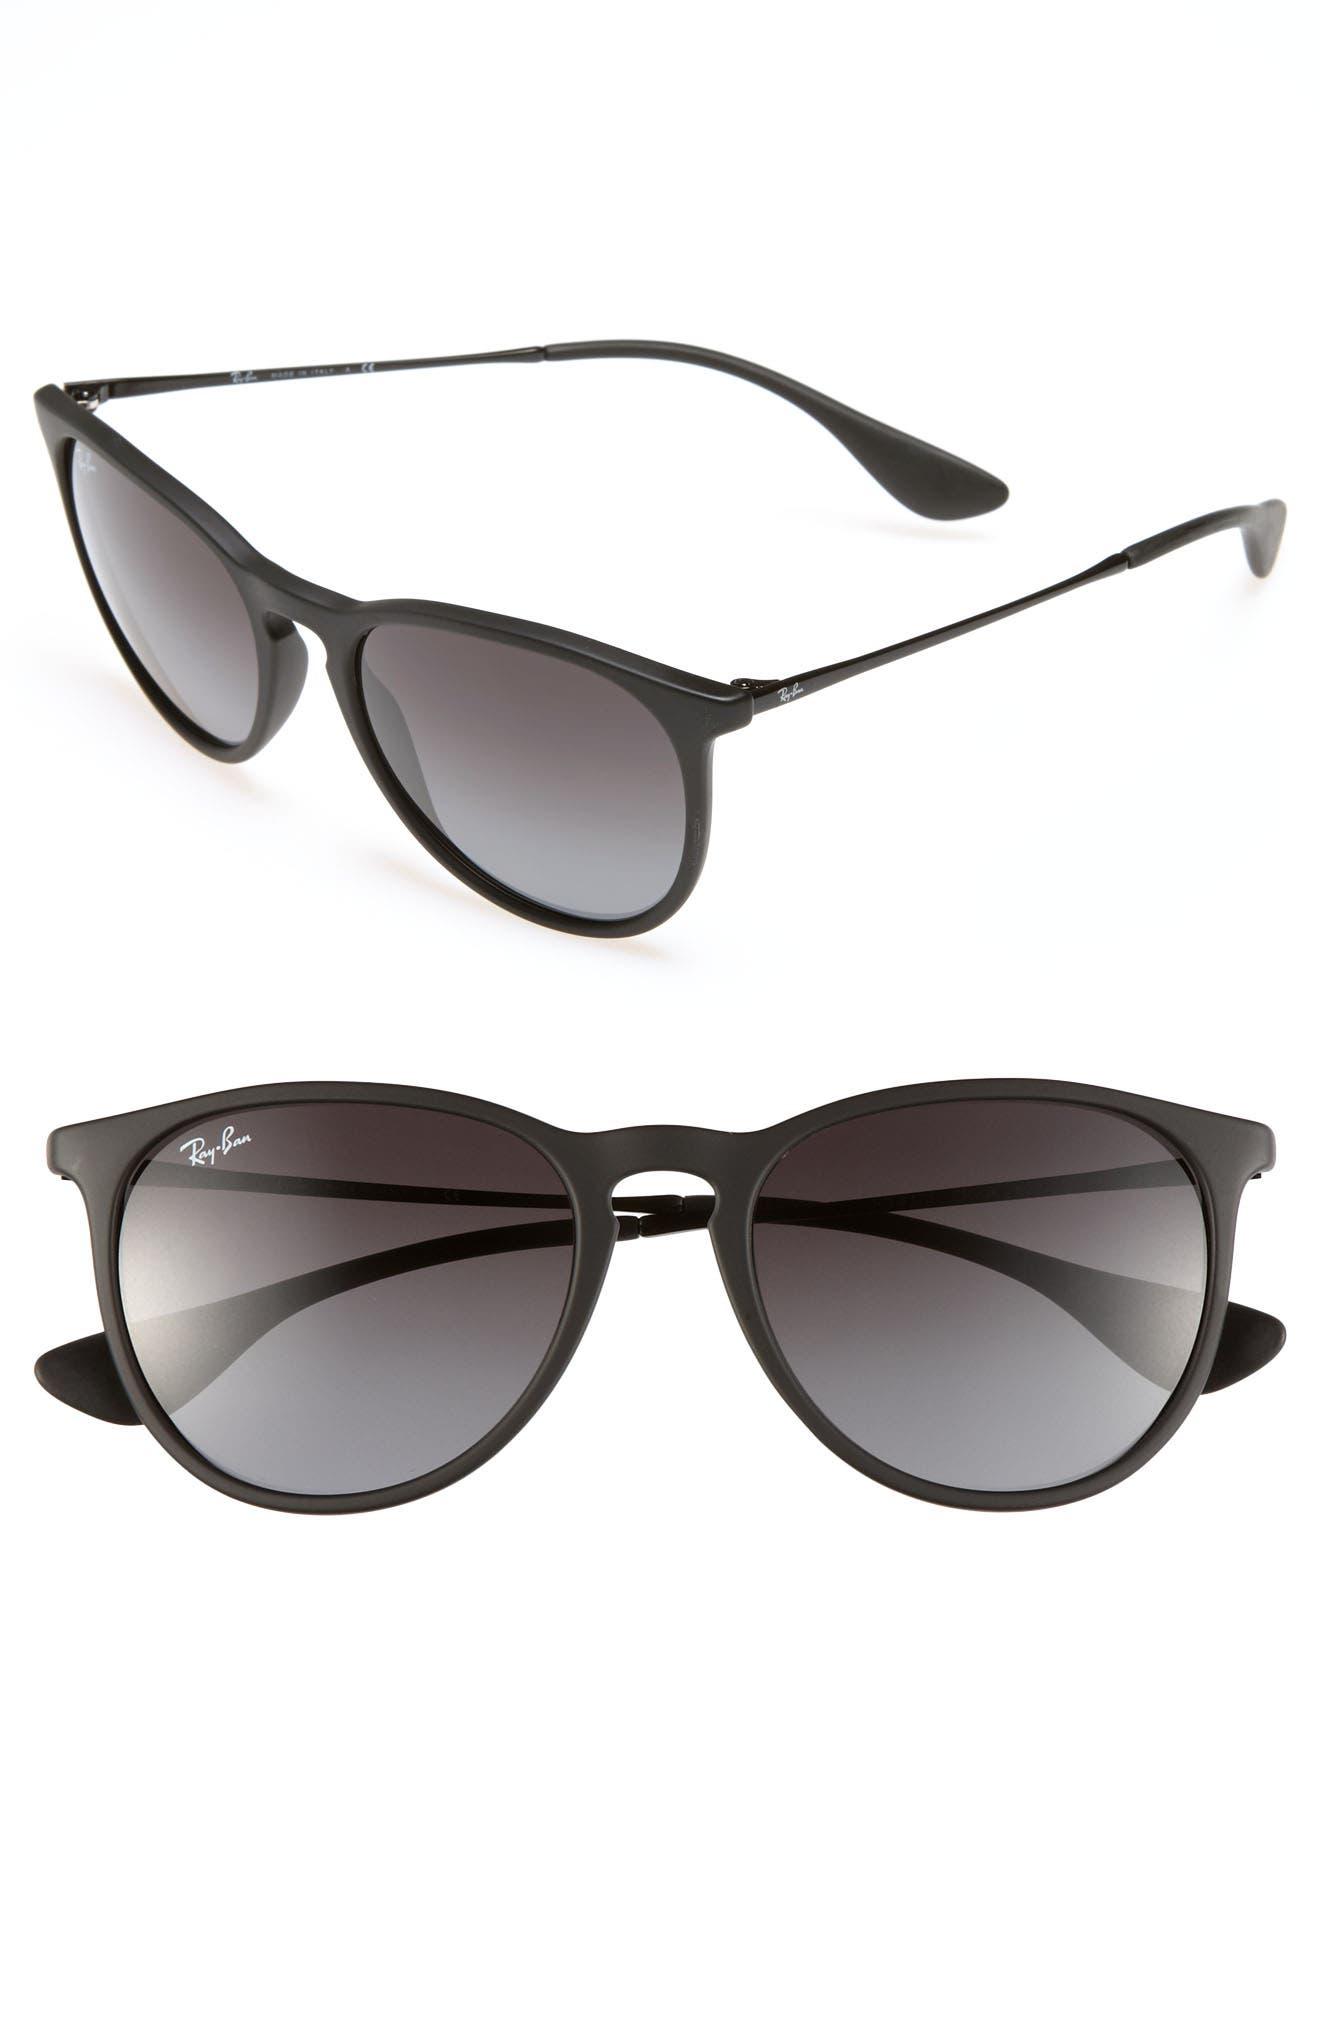 RAY-BAN, Erika Classic 54mm Sunglasses, Main thumbnail 1, color, BLACK/ GREY GRADIENT